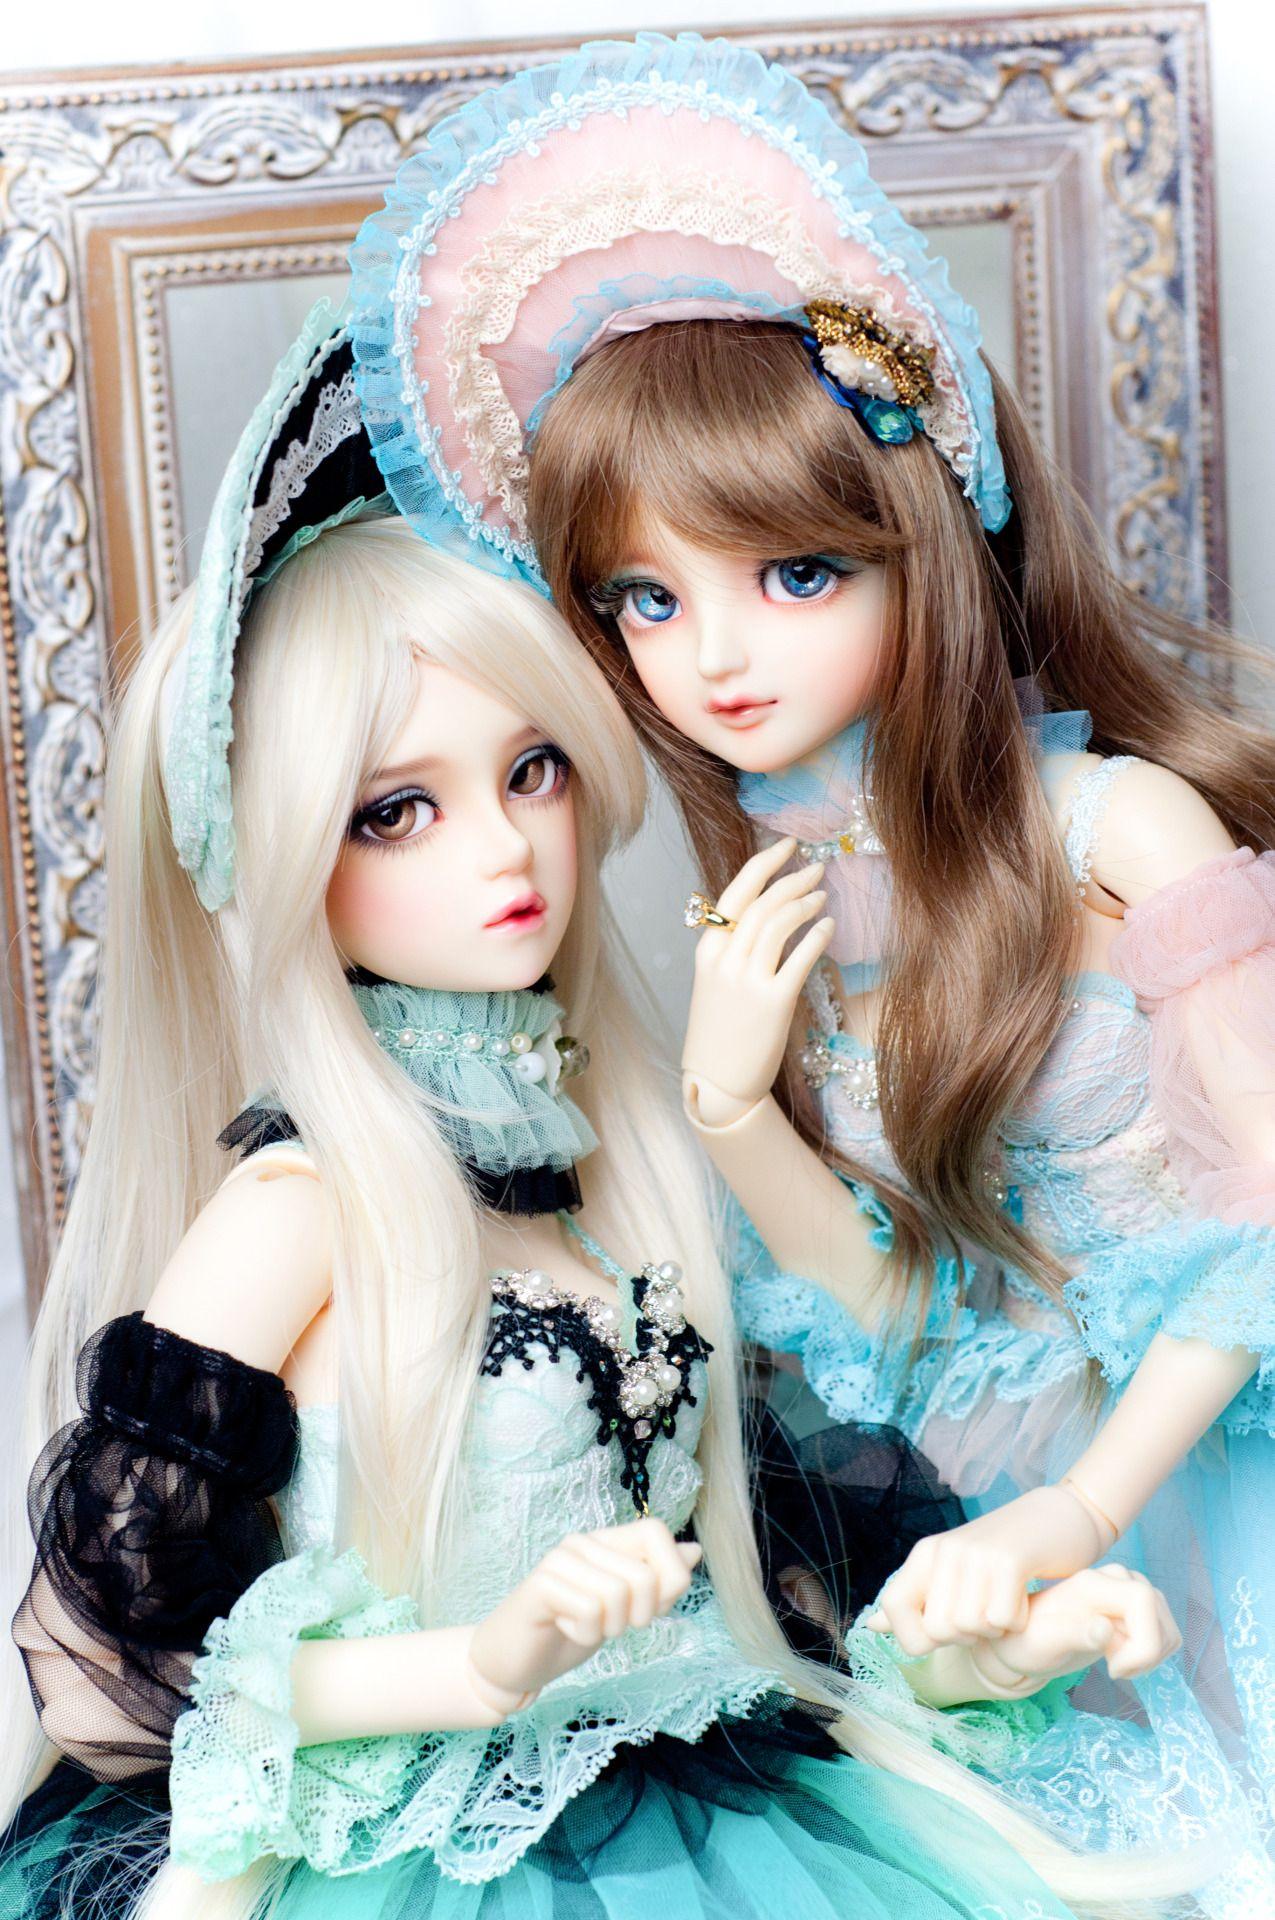 Pin by Moon Danbie on doll Bjd dolls, Art dolls